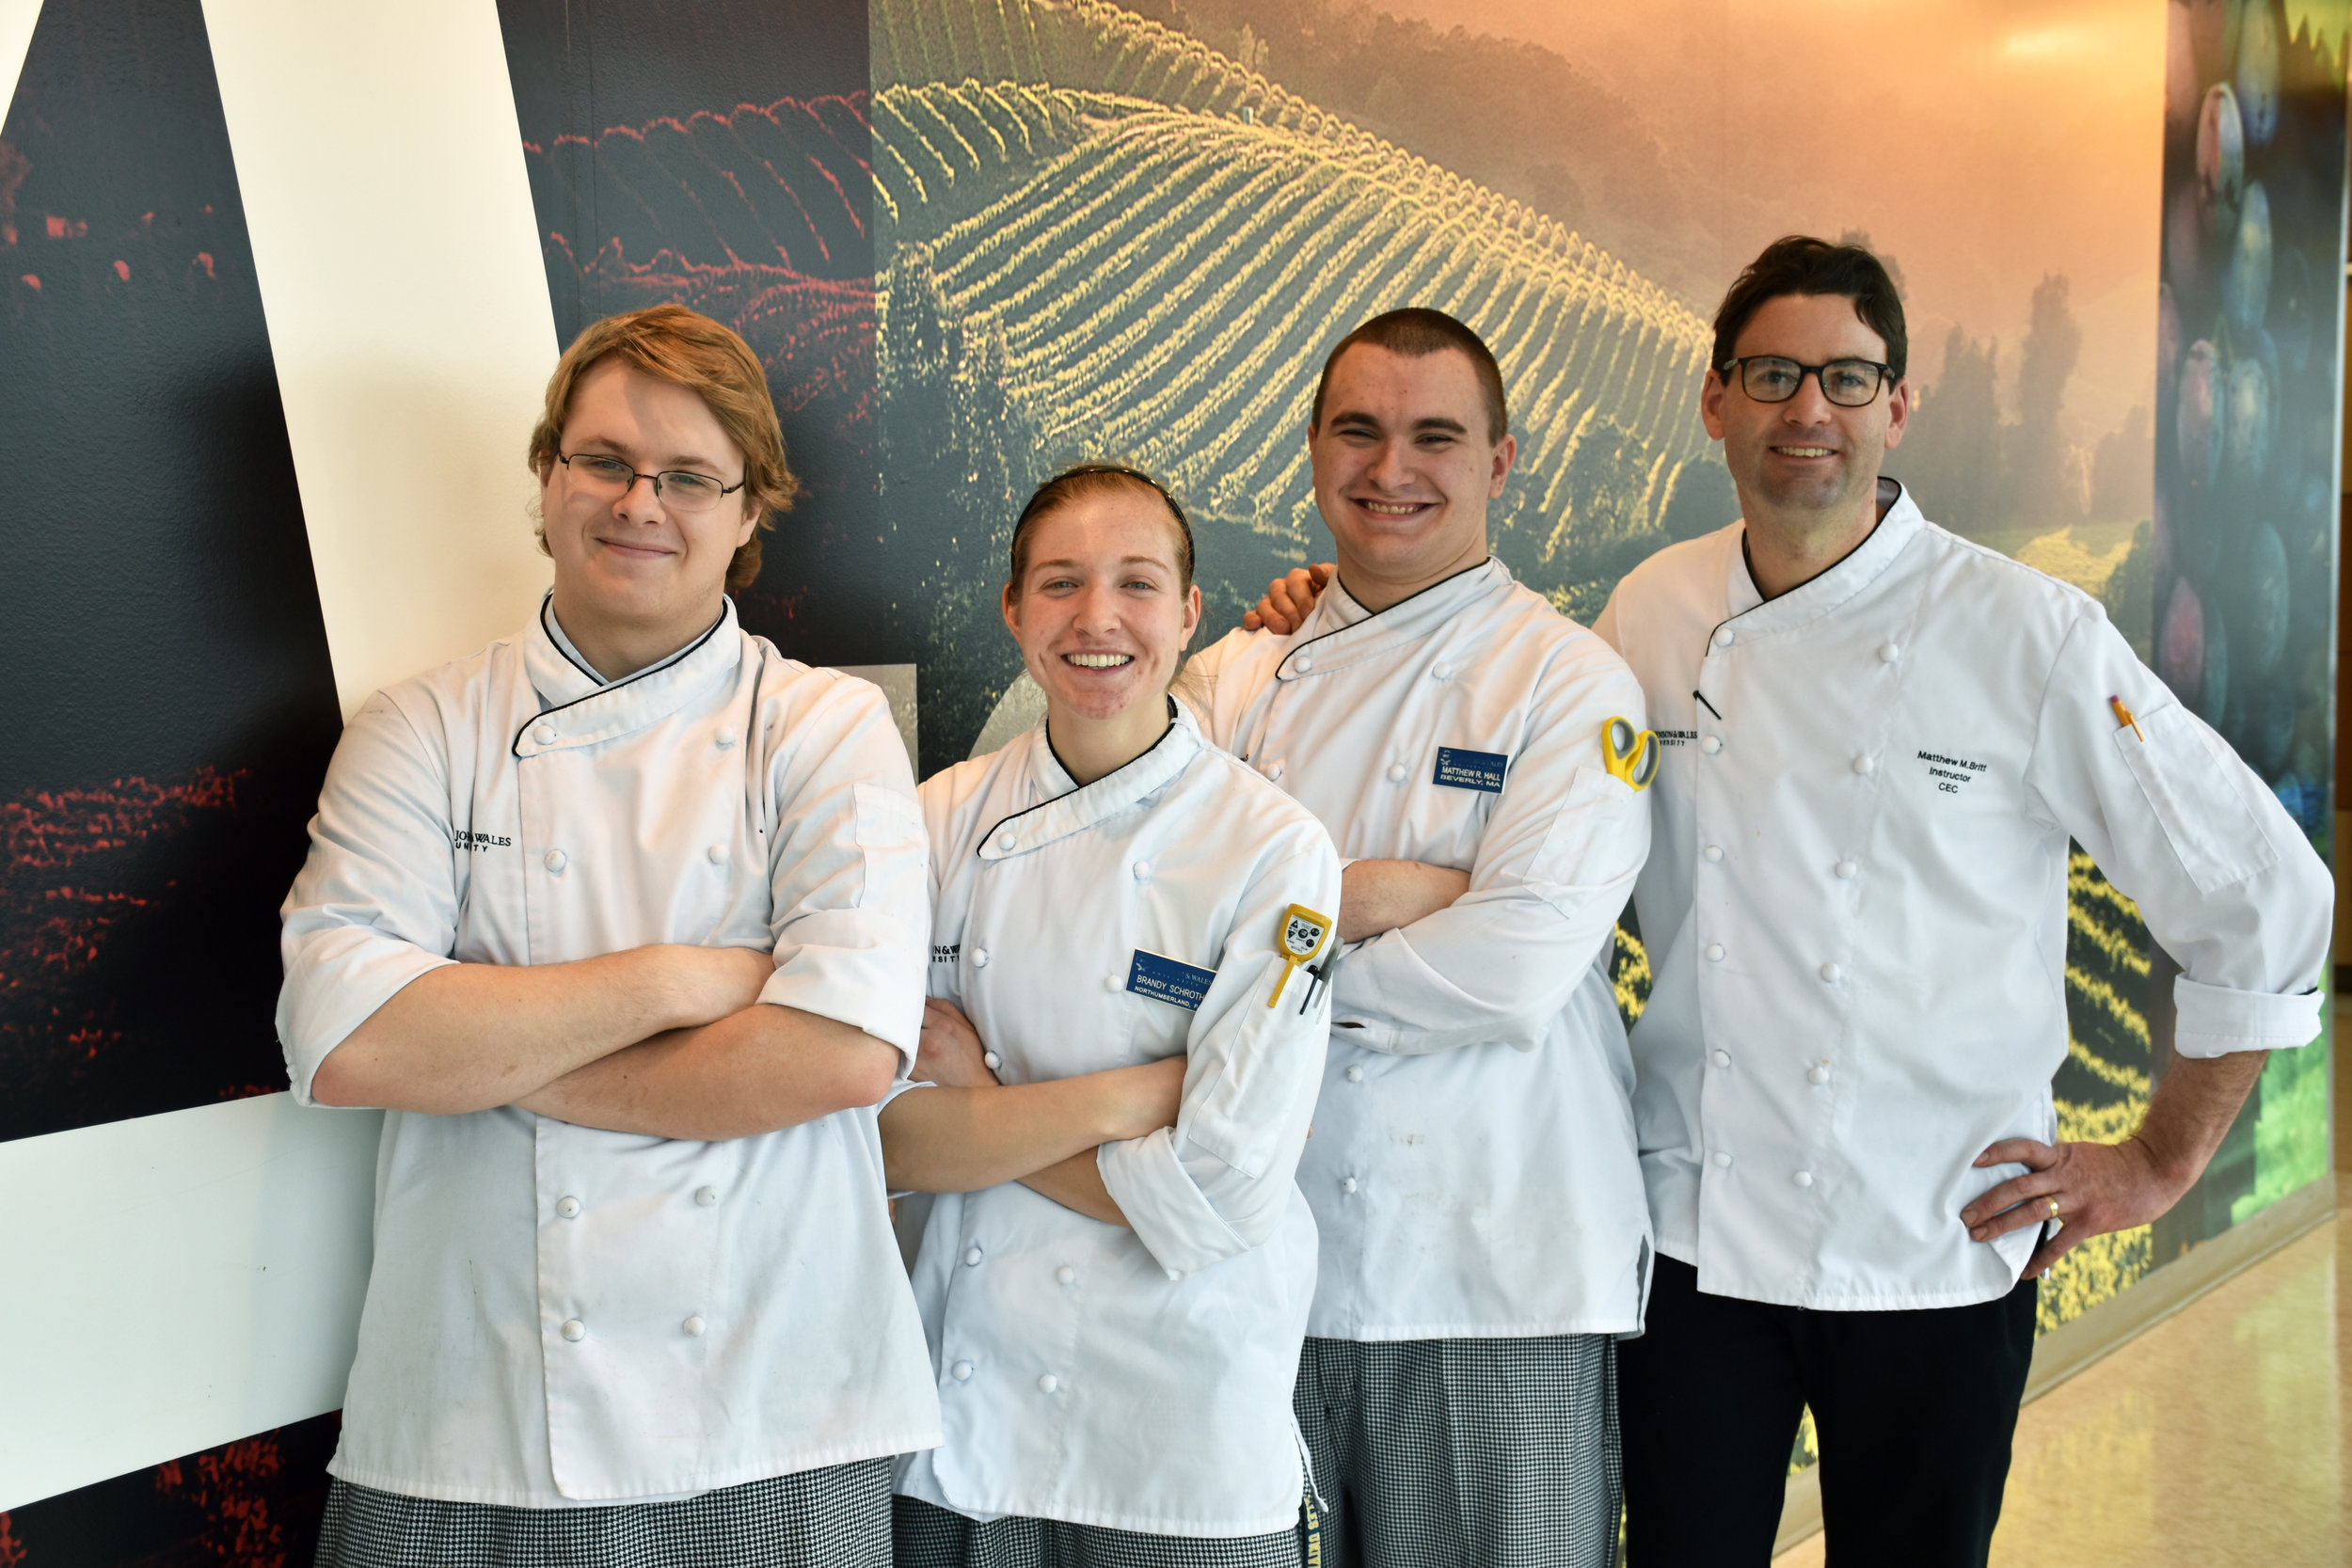 Essex Fried Clams team: Jake Vincent '20, Brandy Schroth '20, Matthew Hall '20, and Chef Matthew Britt (missing from photo is Idacia Miles '20)